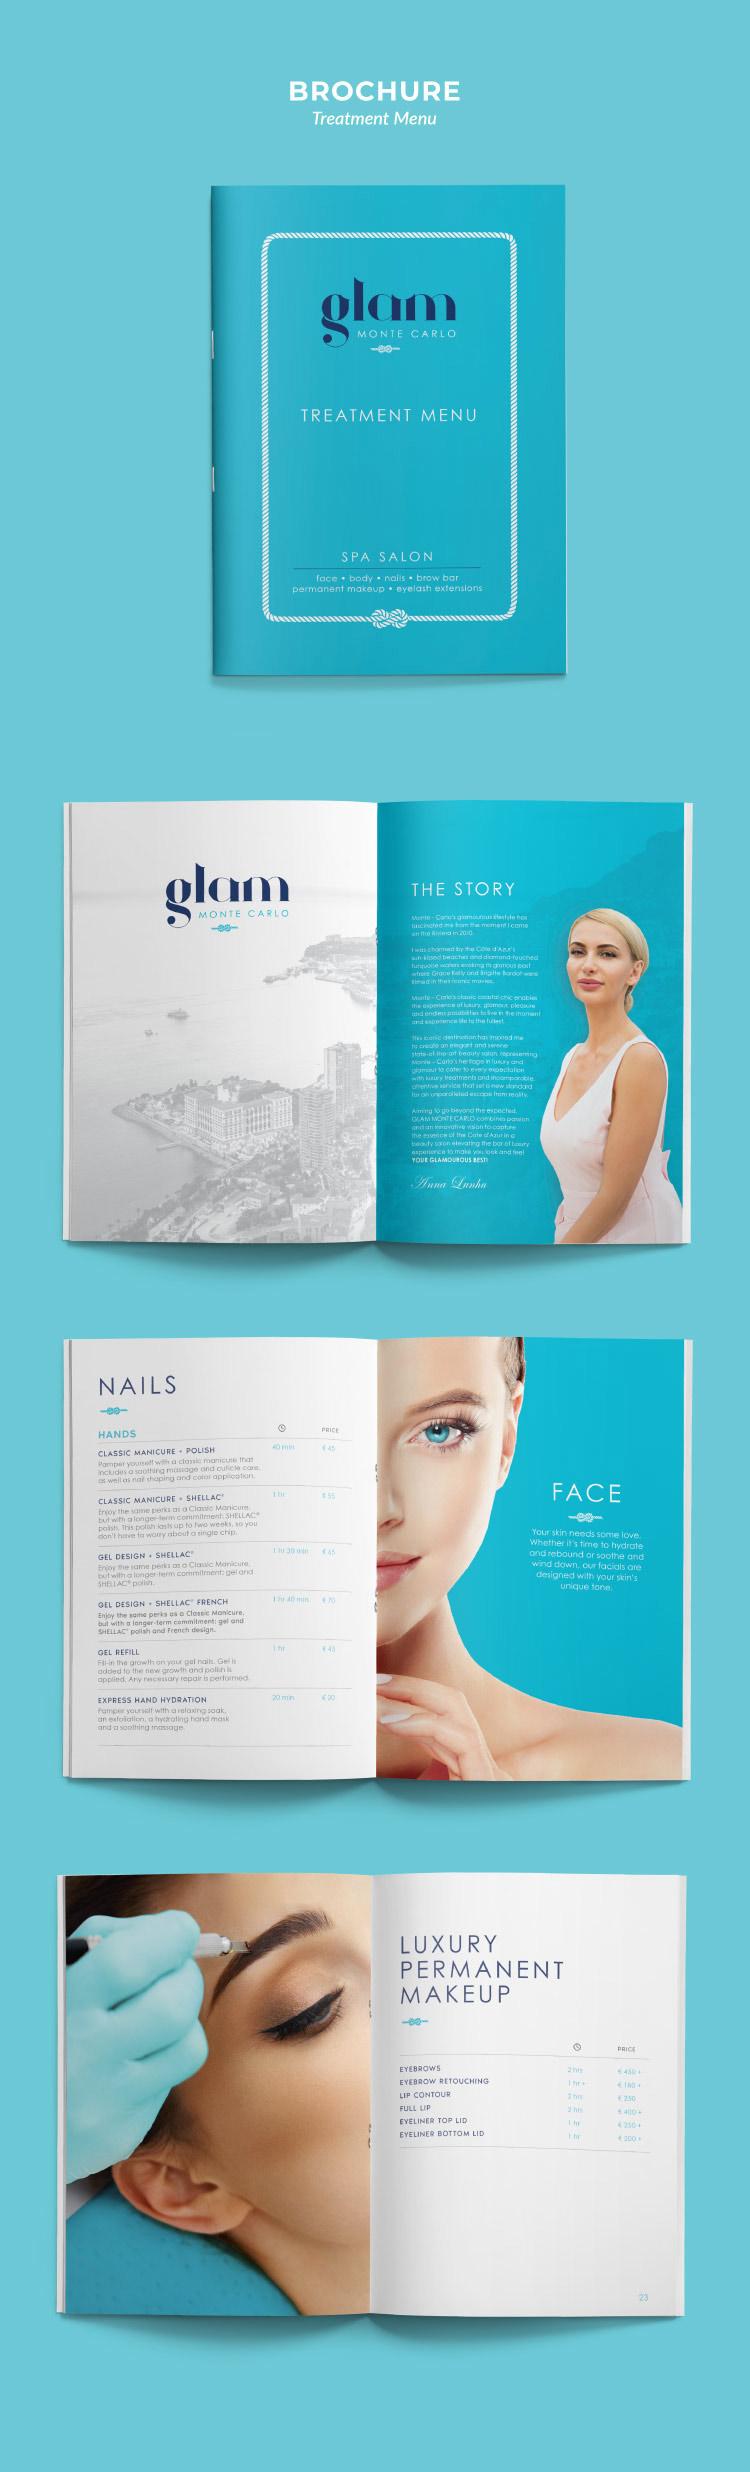 Spa salon brochure design